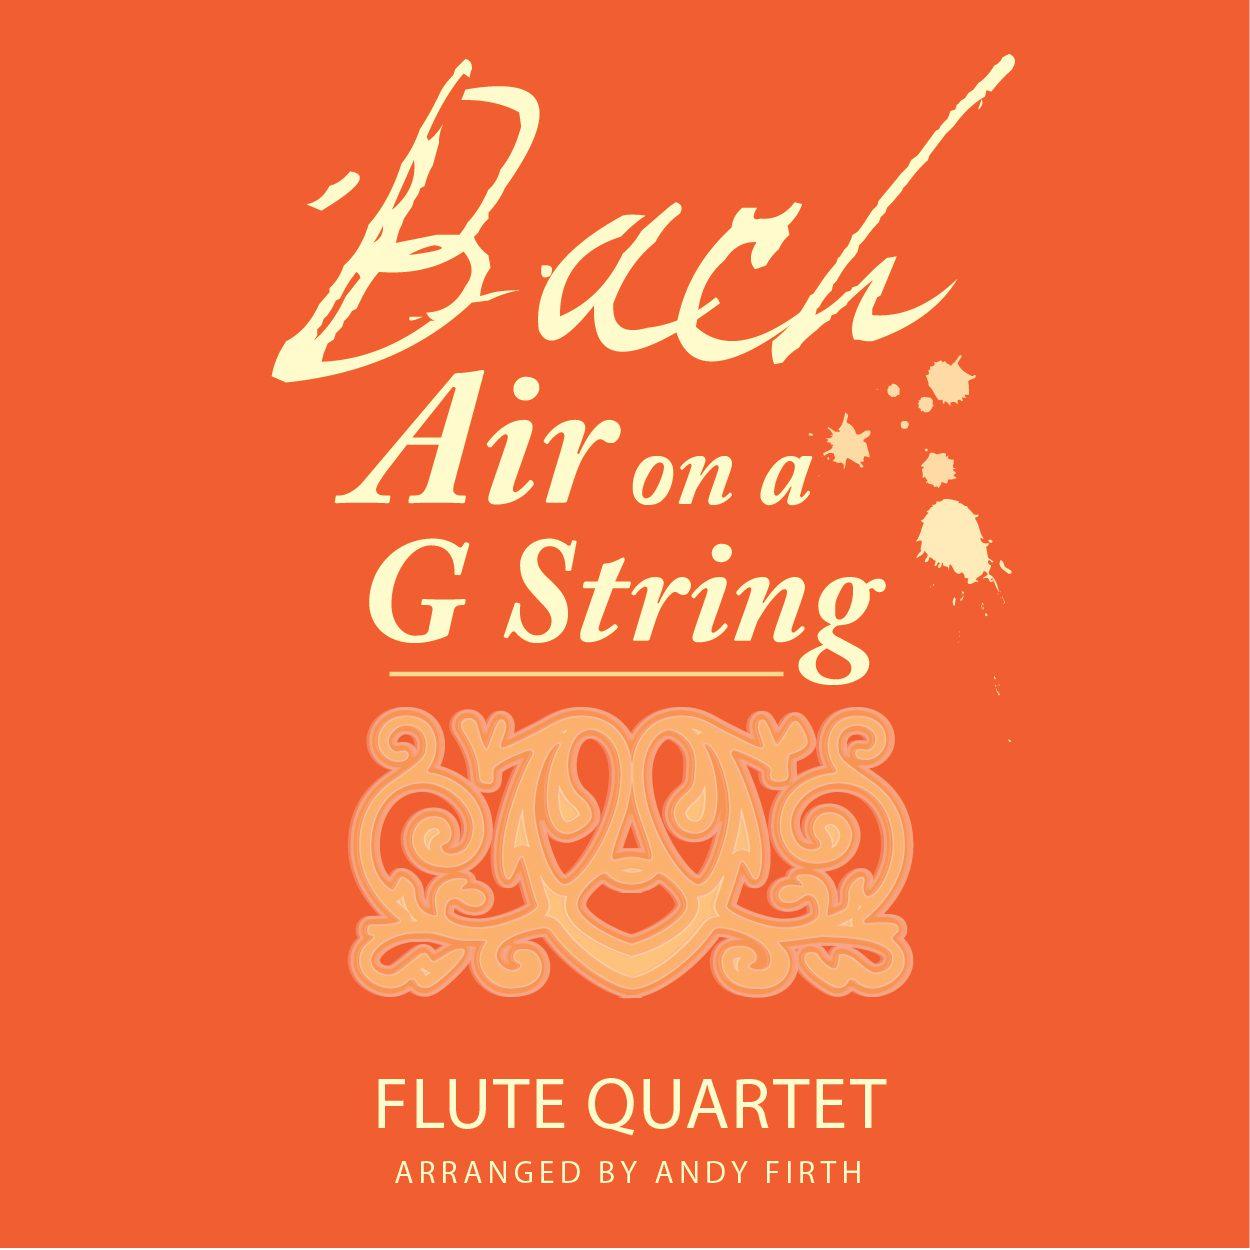 Air on a G String Arranged for Flute Quartet